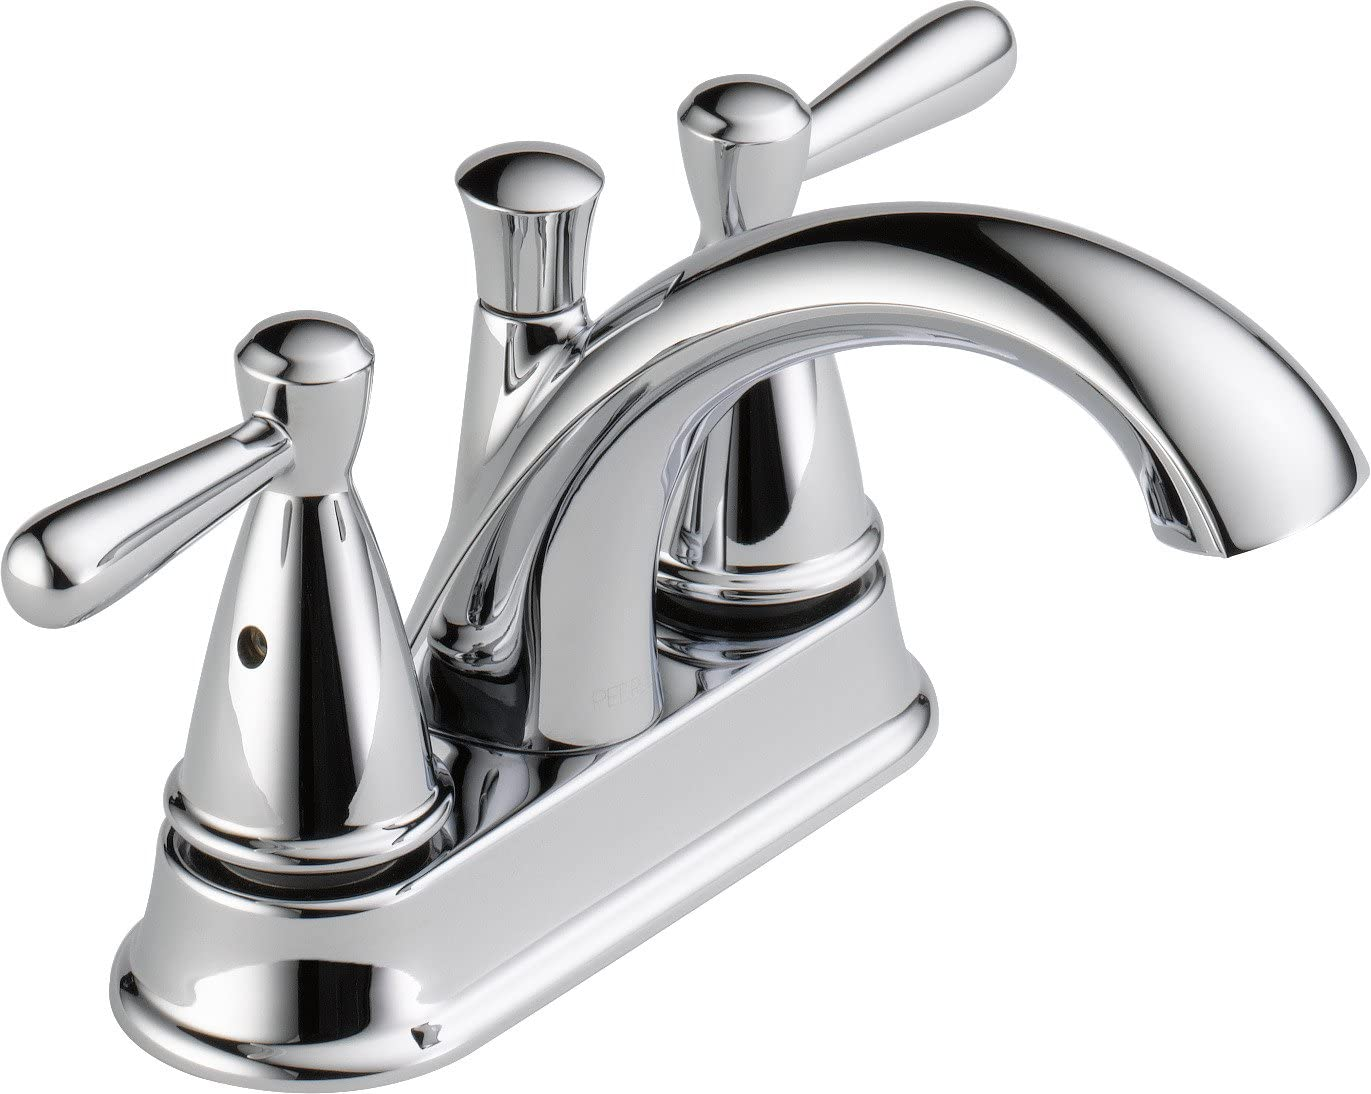 Peerless Bayside Centerset Bathroom Faucet Chrome, Bathroom Sink Faucet, Chrome P99640LF